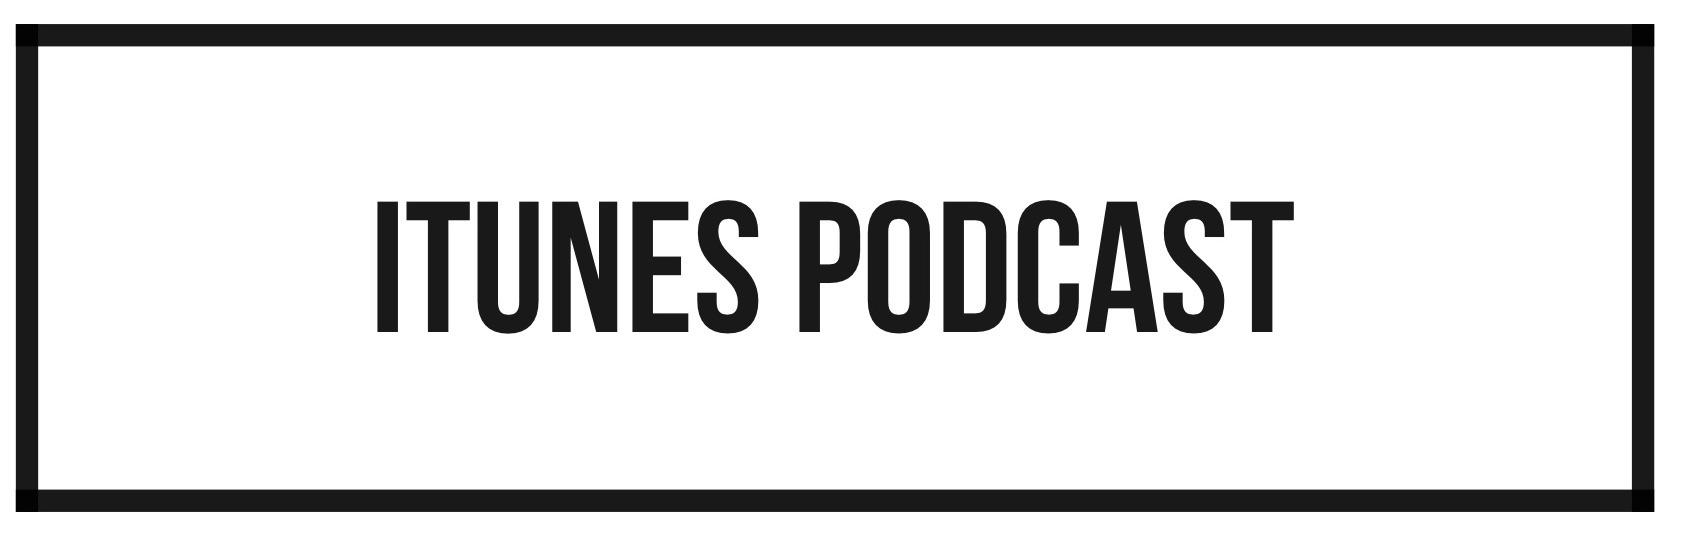 itunes best self-help podcast